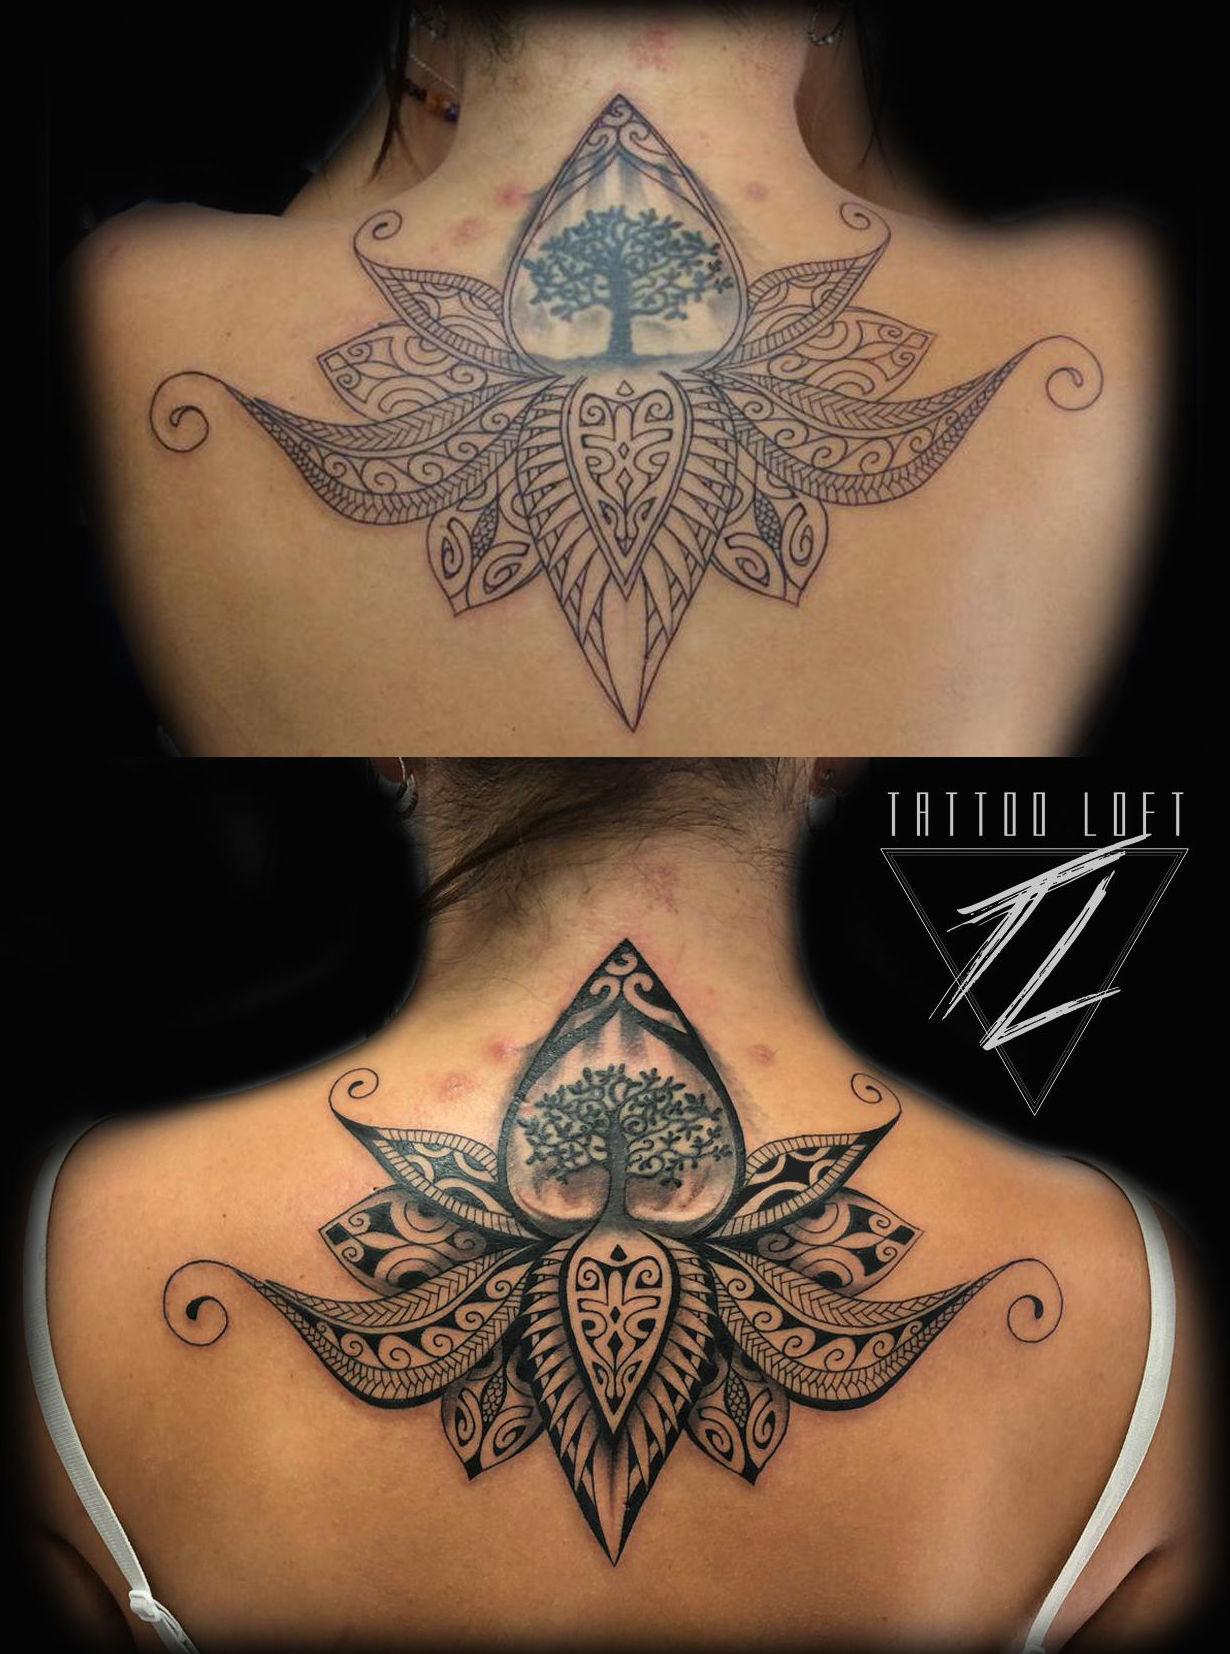 Foto 54 de Estudio artístico de tatuaje en  | Tattoo Loft